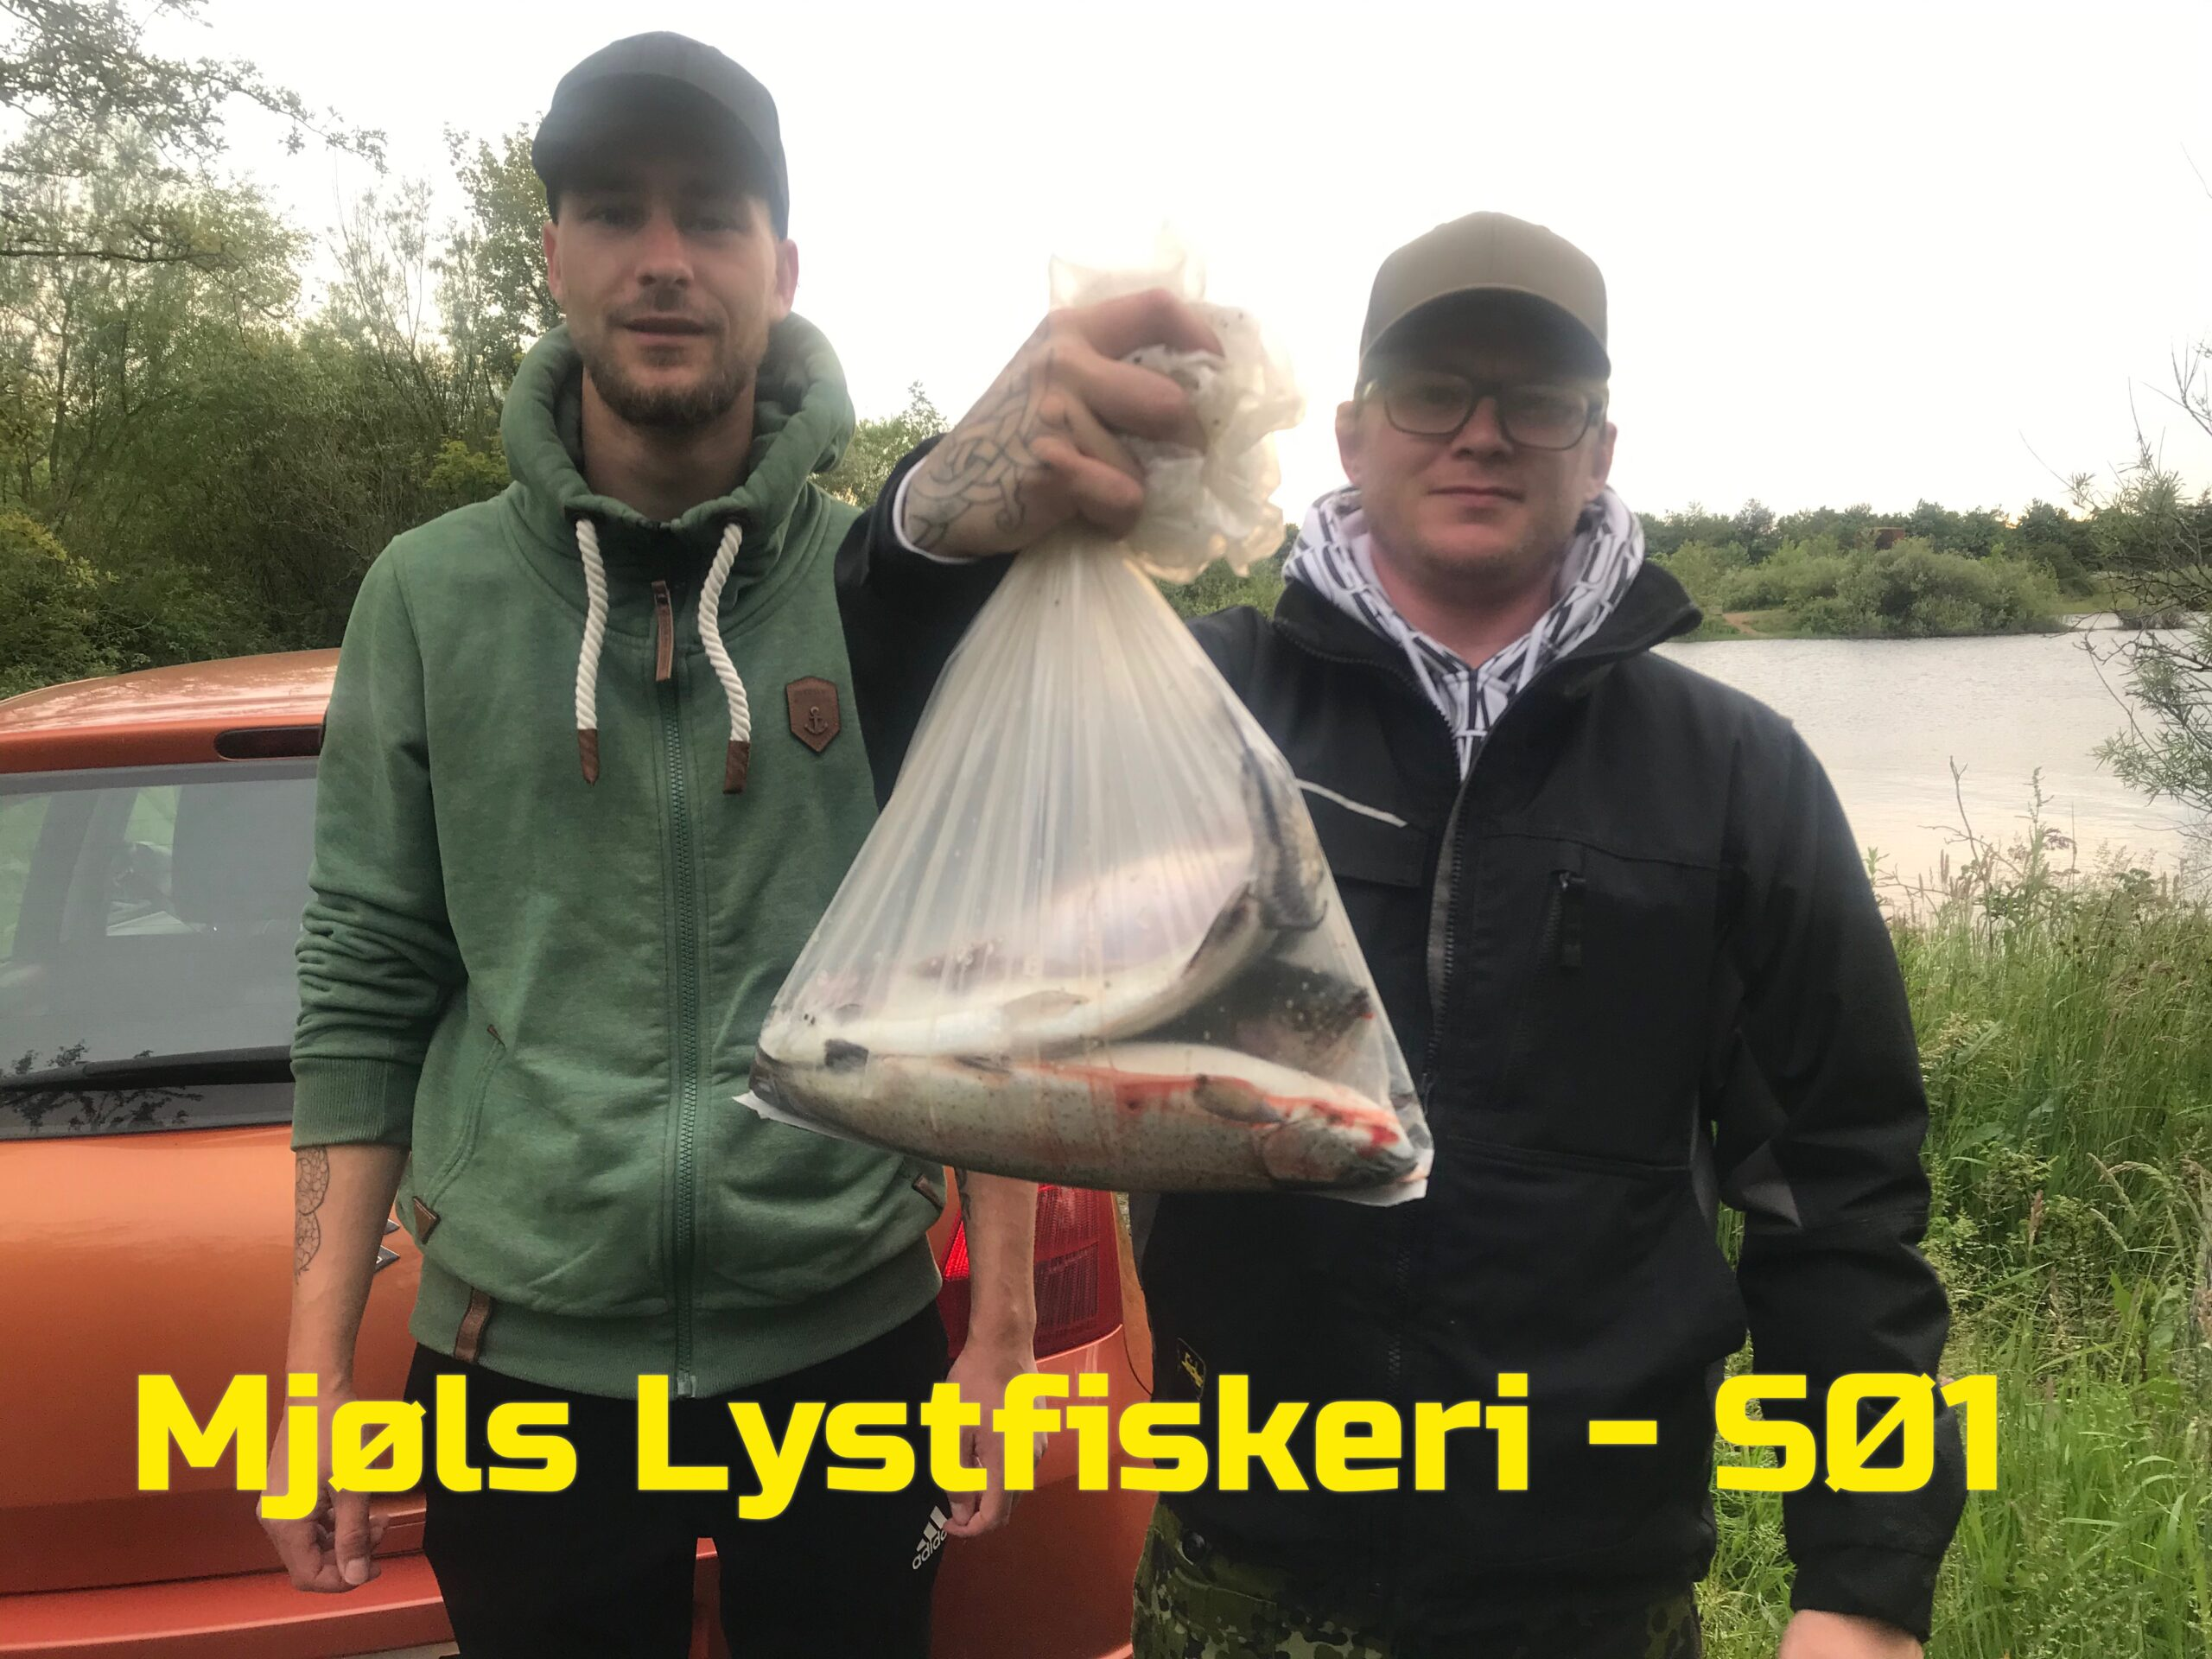 Mjøls Lystfiskeri – Kenneth og Sune fik fisk på krogen